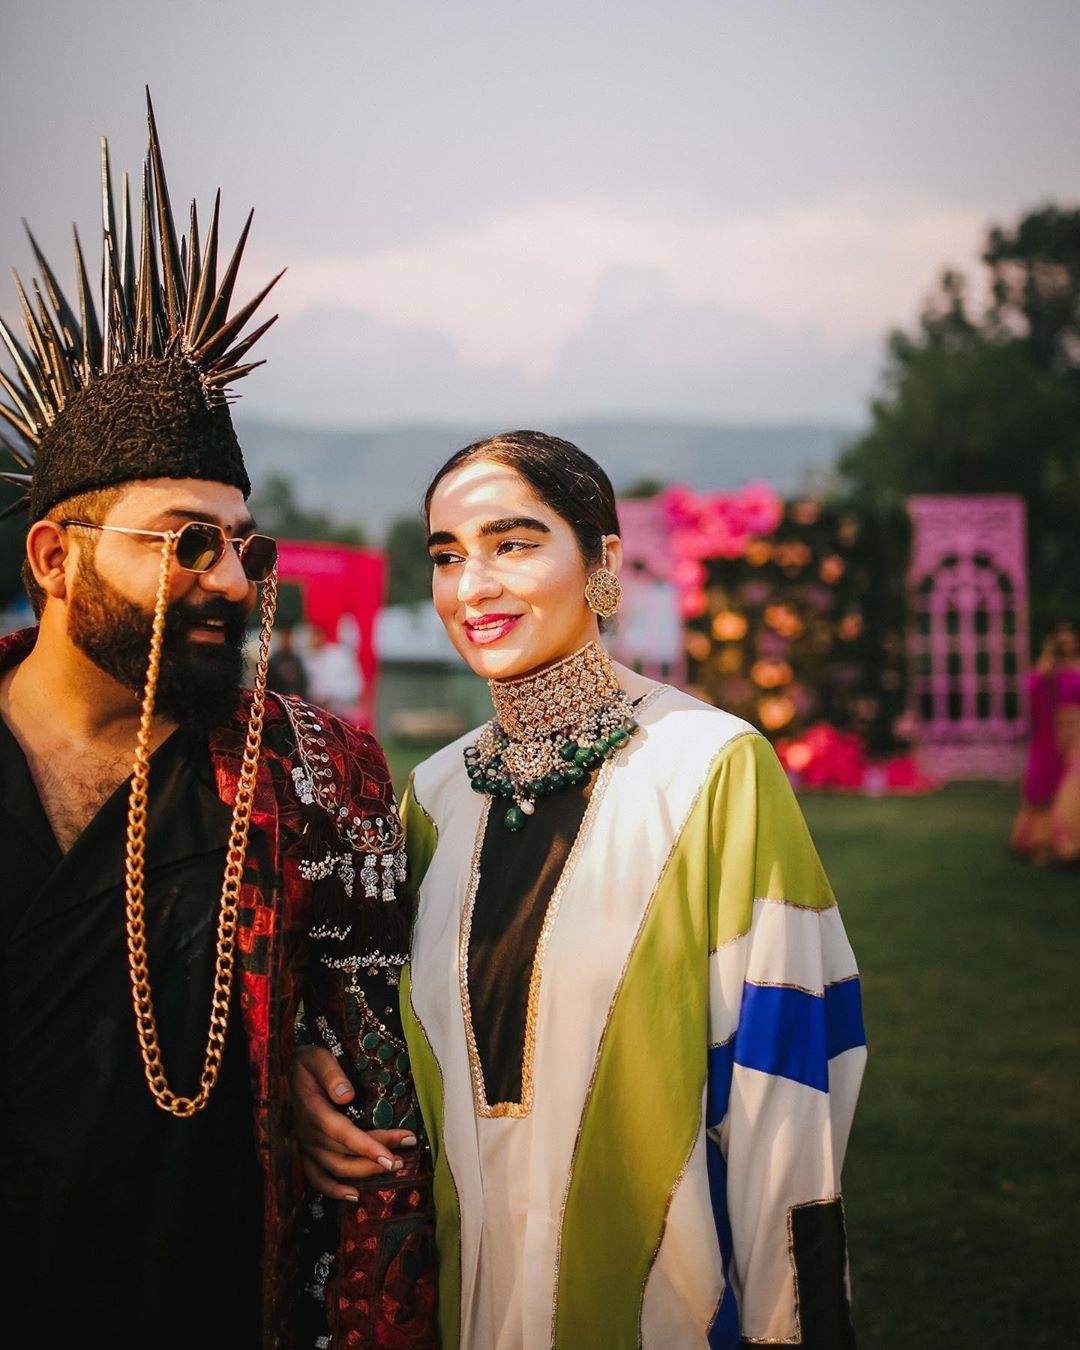 Urwa Hocane and Farhan Saeed Clicks From Friends Wedding